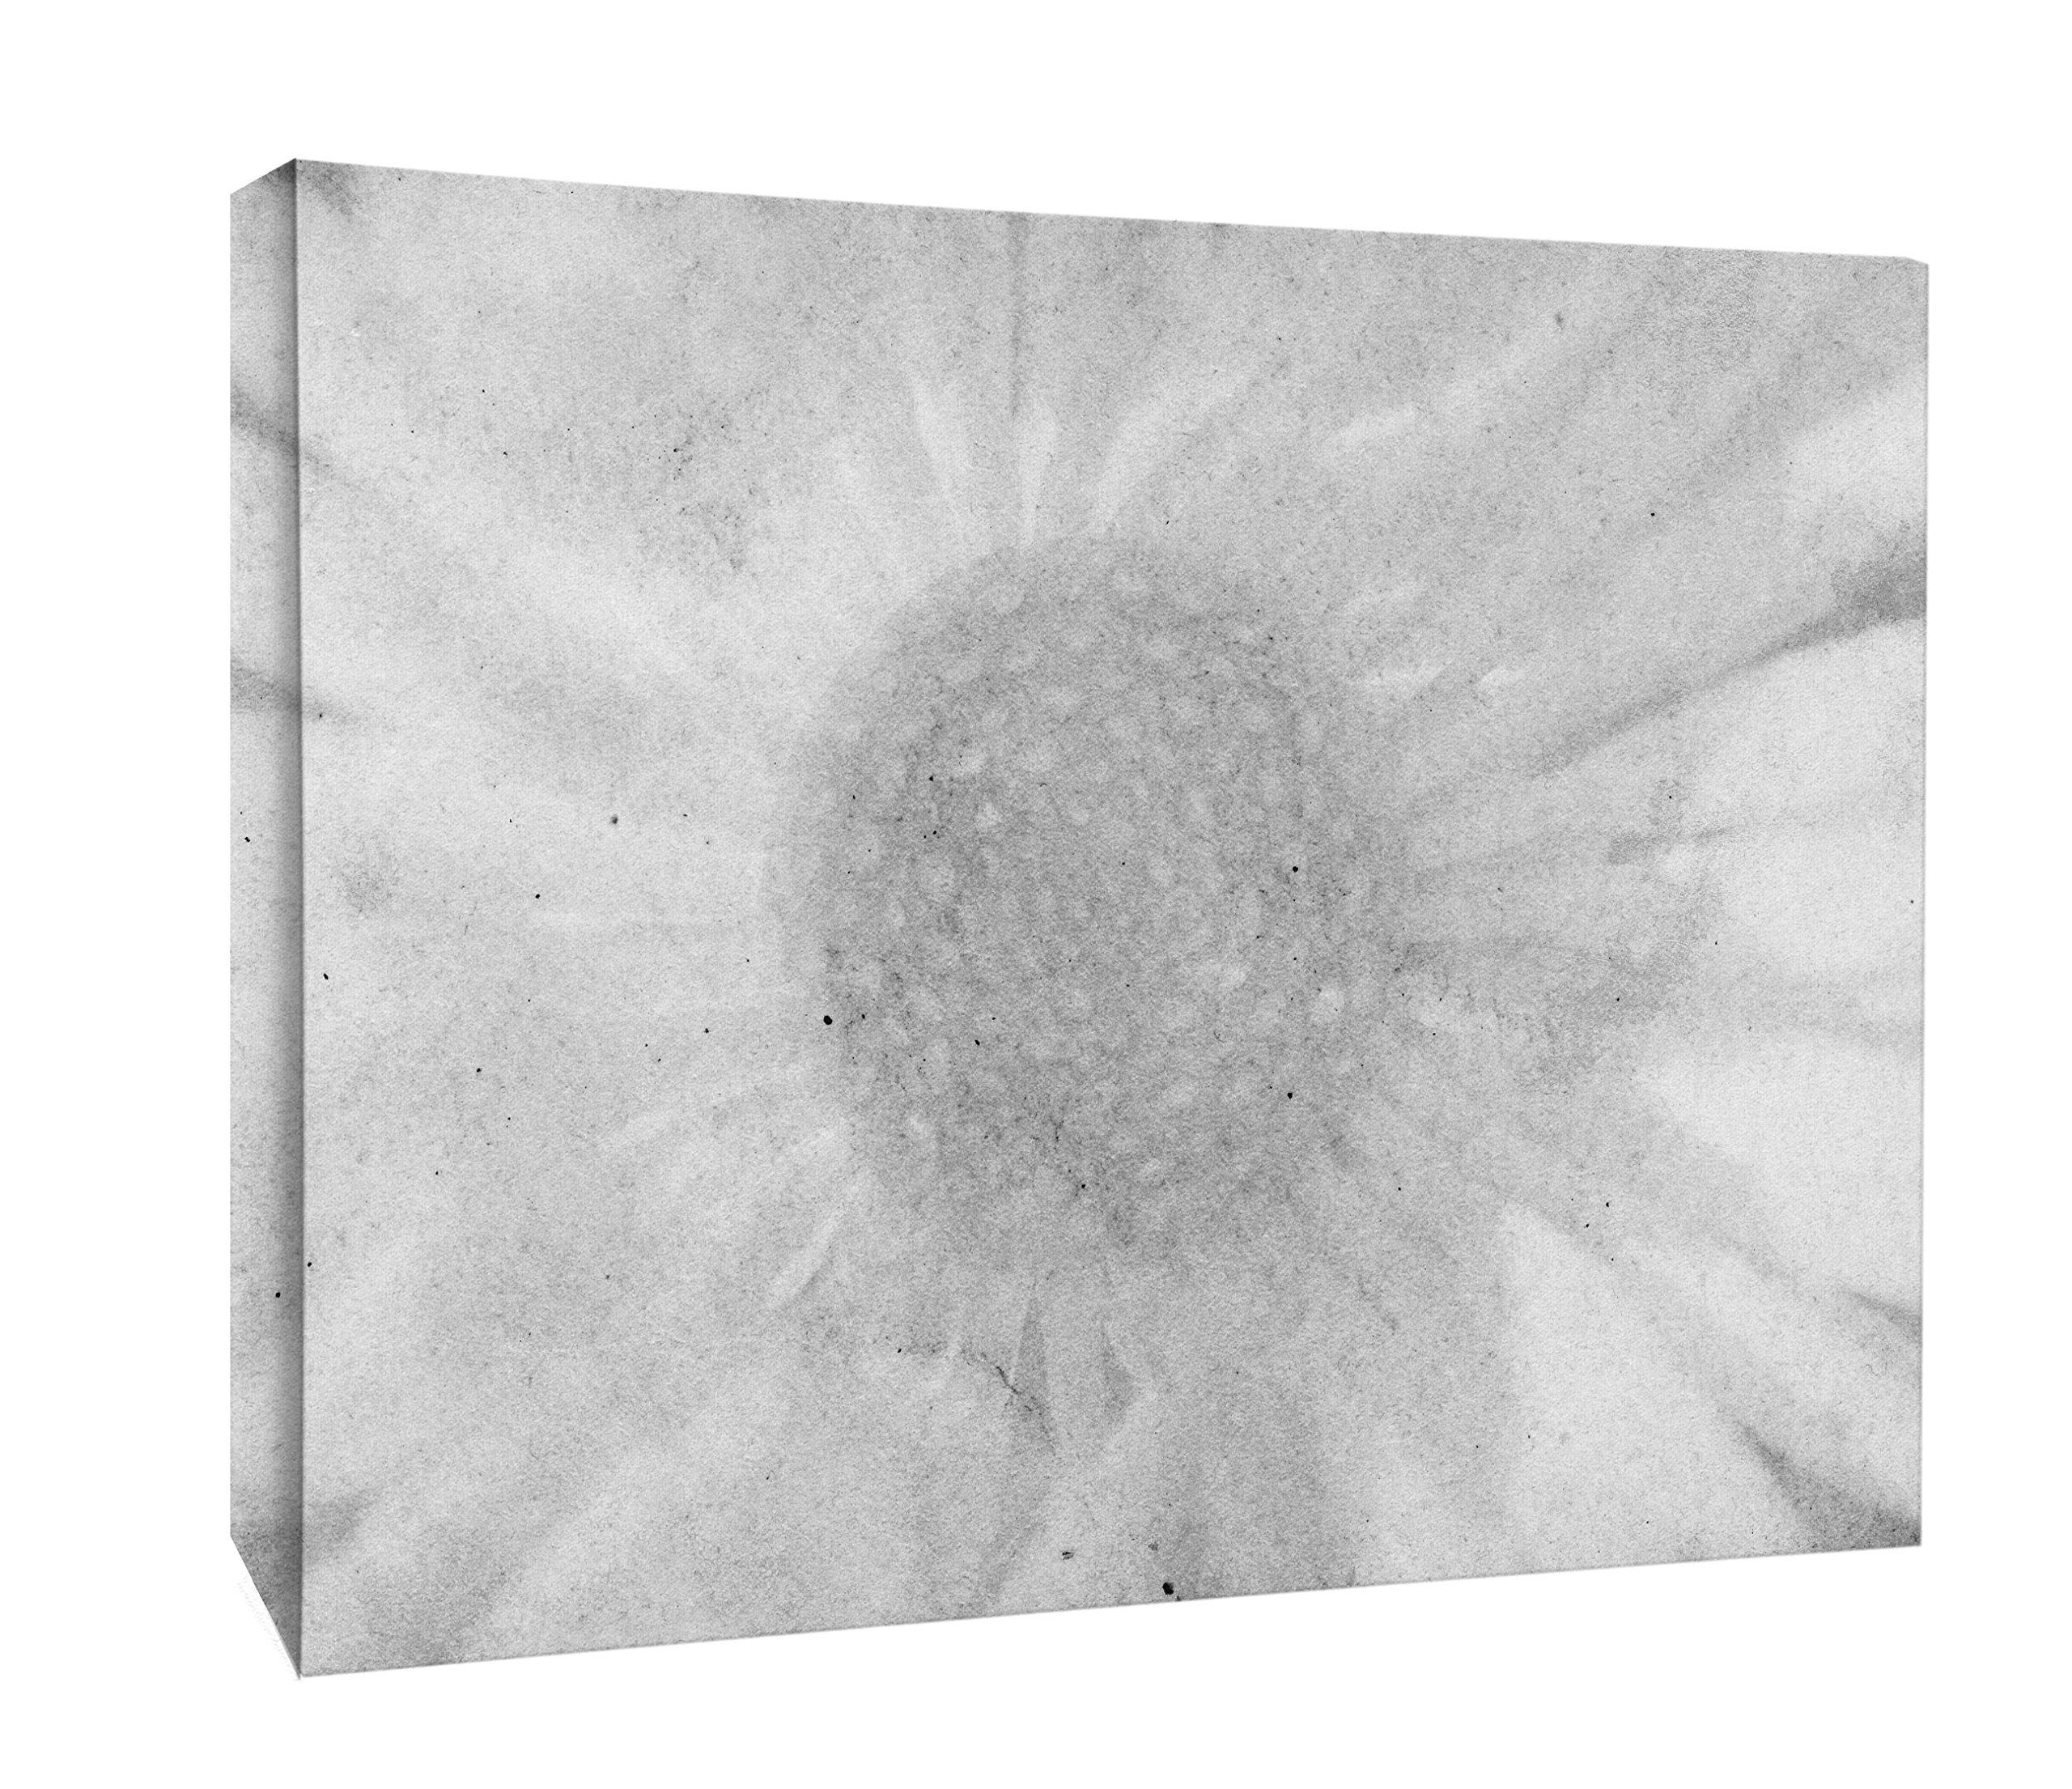 JP London BWMCNV2092 2'' Thick Heavyweight Black & White Gallery Wrap Canvas Hendrix Grunge Flower Power Wallpaper, 24 x 36''